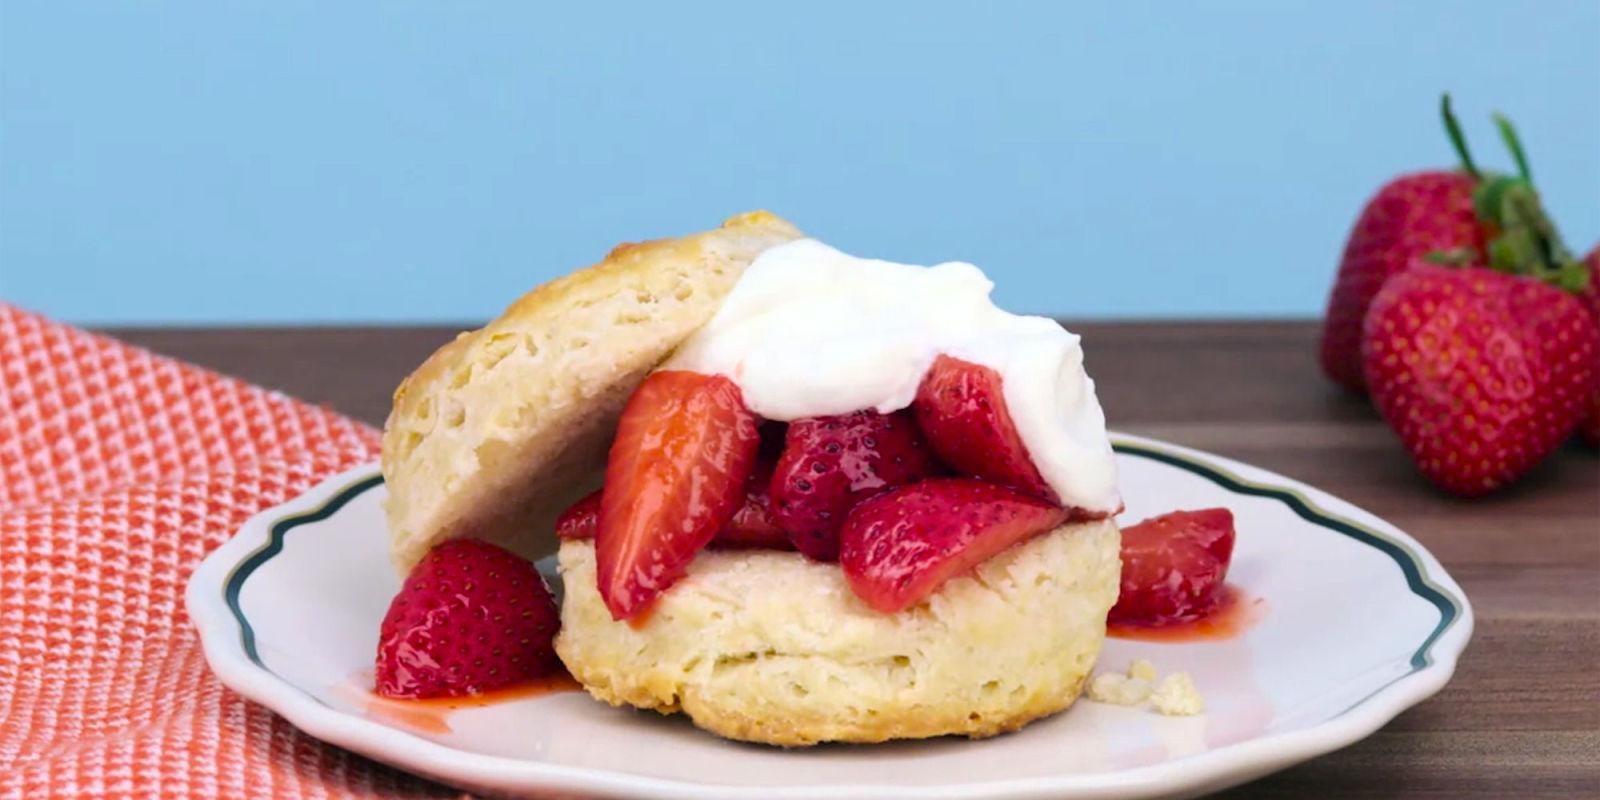 Roasted Strawberry Shortcake Recipe - Watch How to Make ...